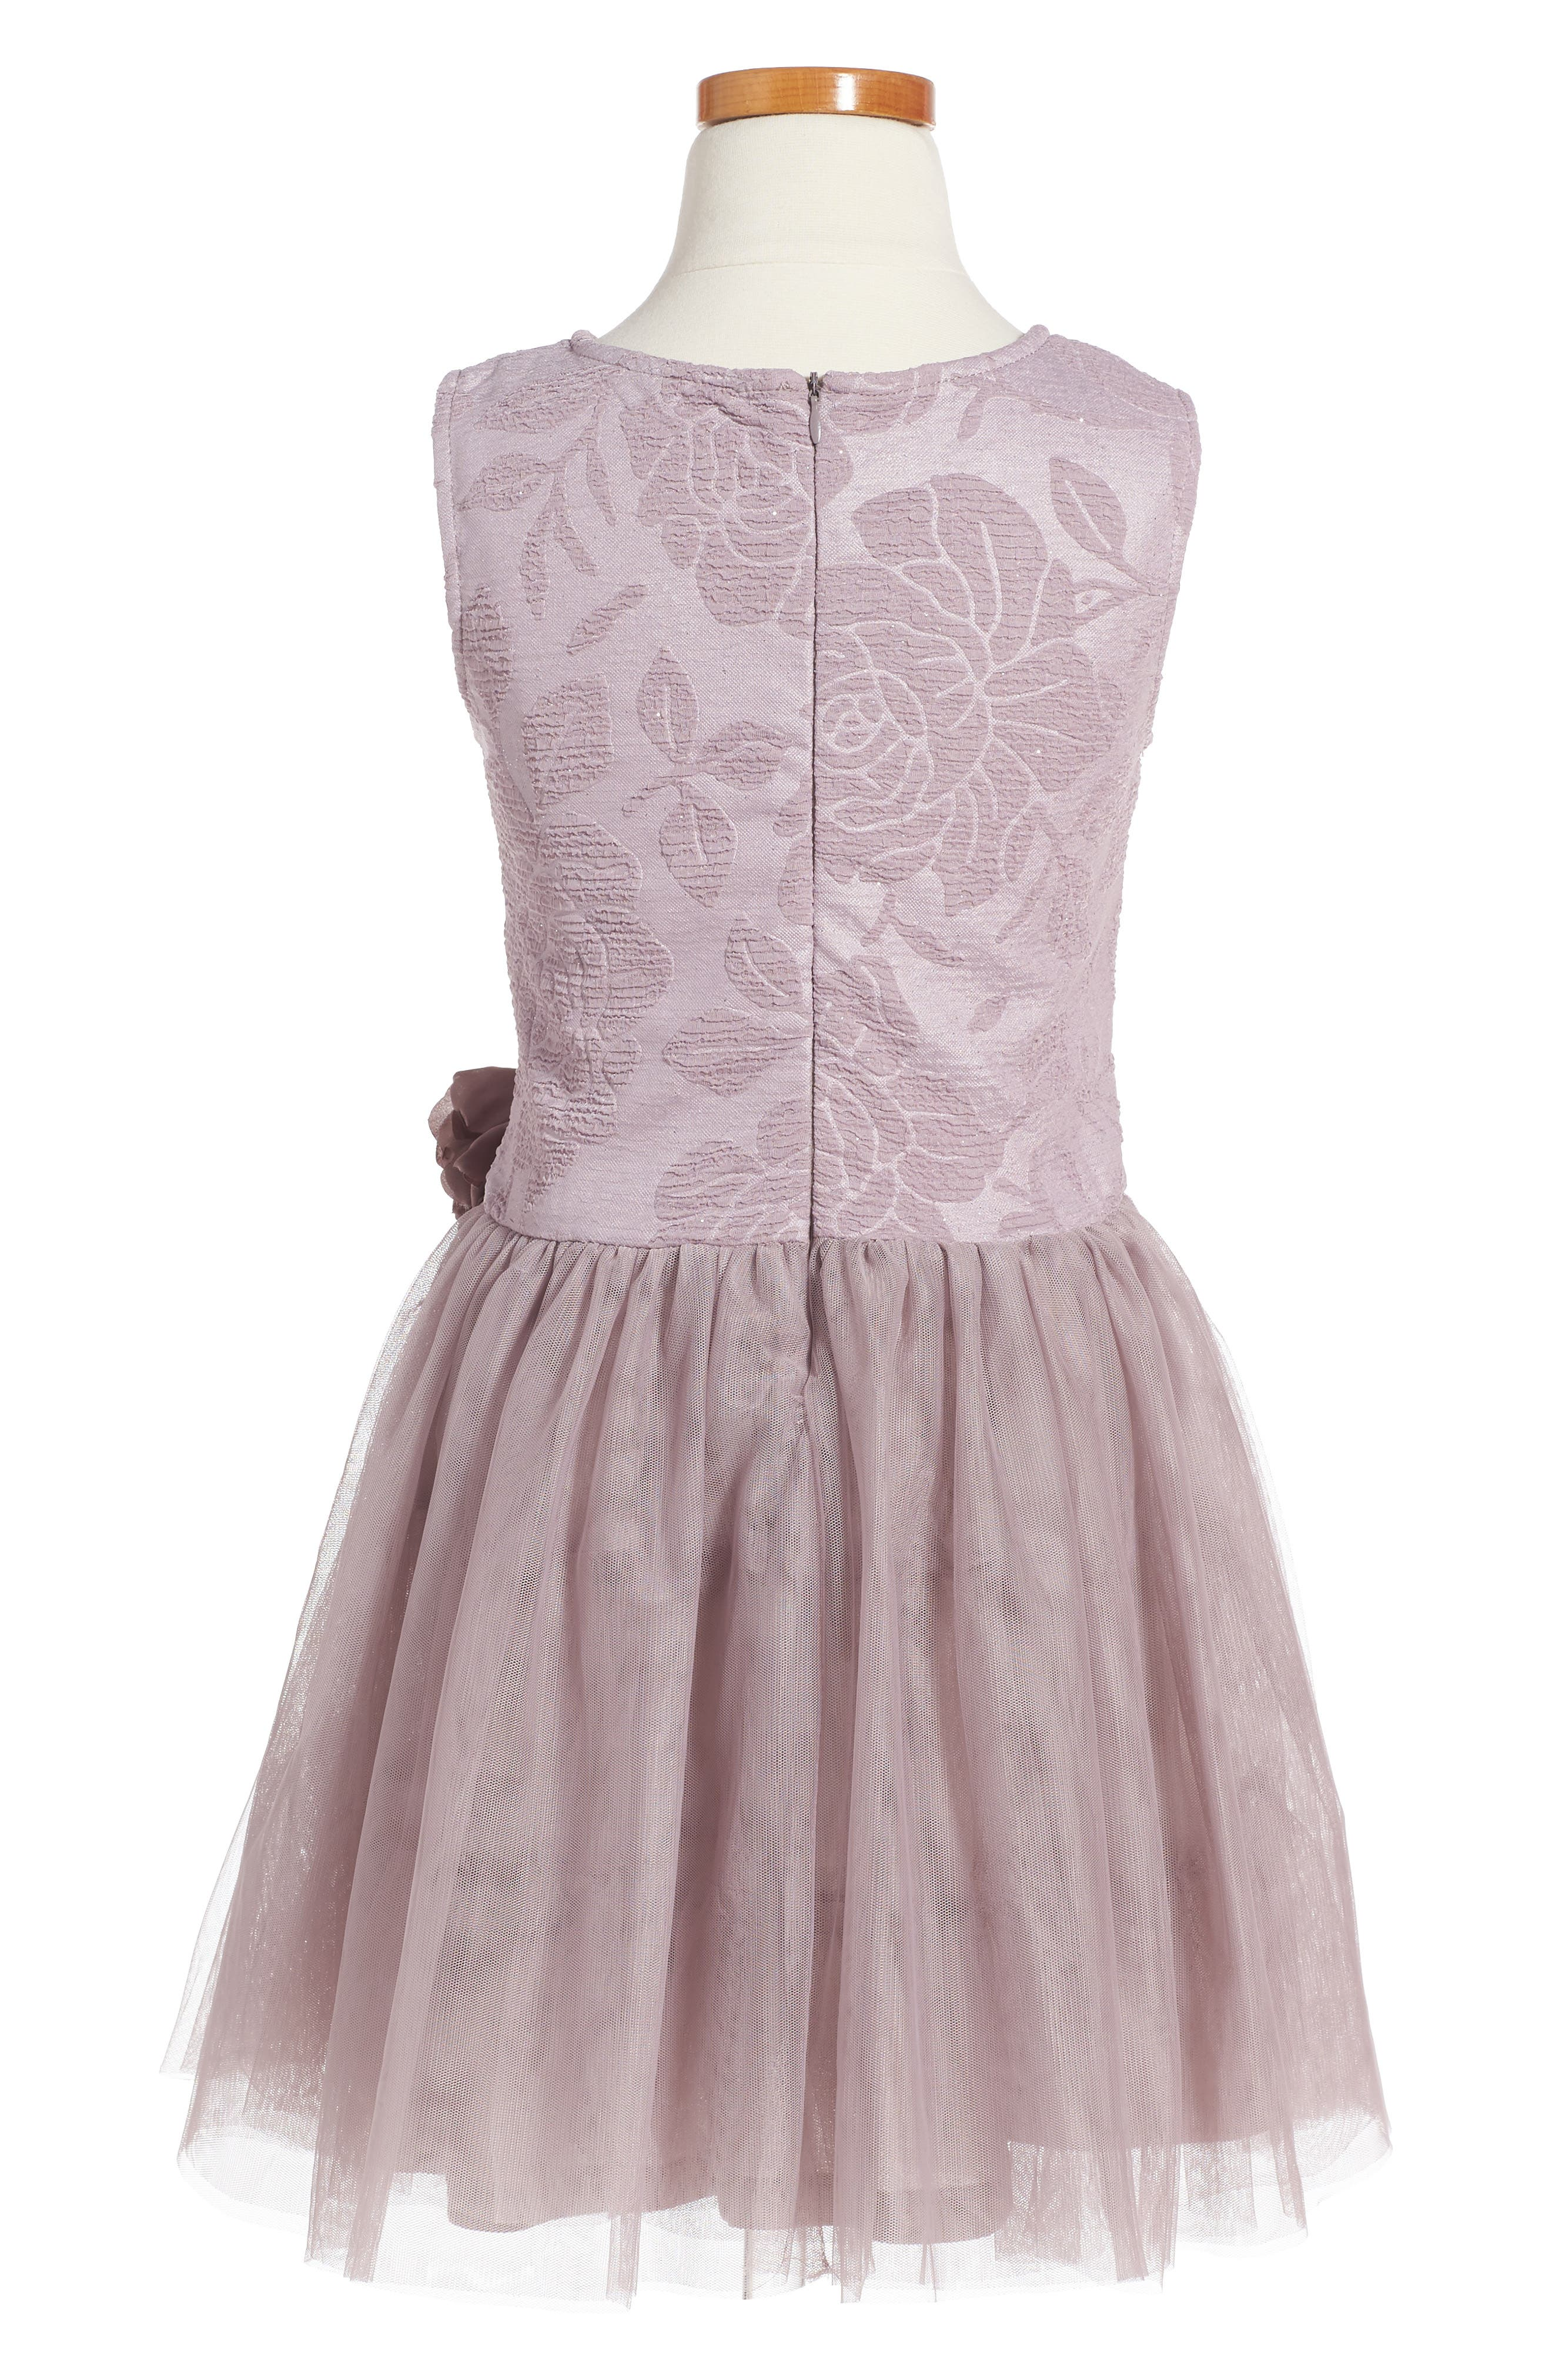 Embossed Rose Tutu Dress,                             Alternate thumbnail 2, color,                             690